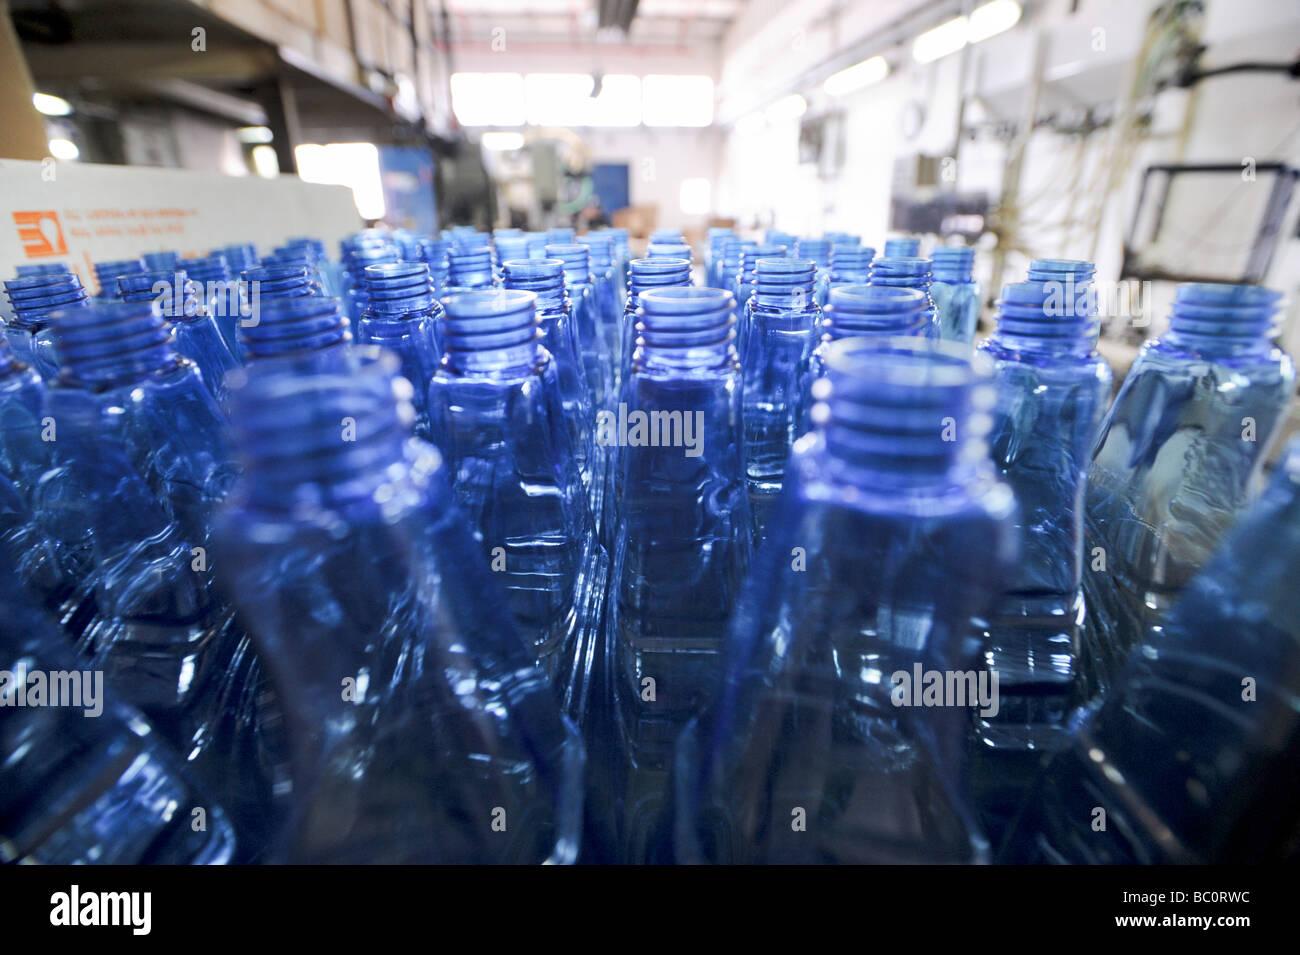 Detergent bottling plant - Stock Image